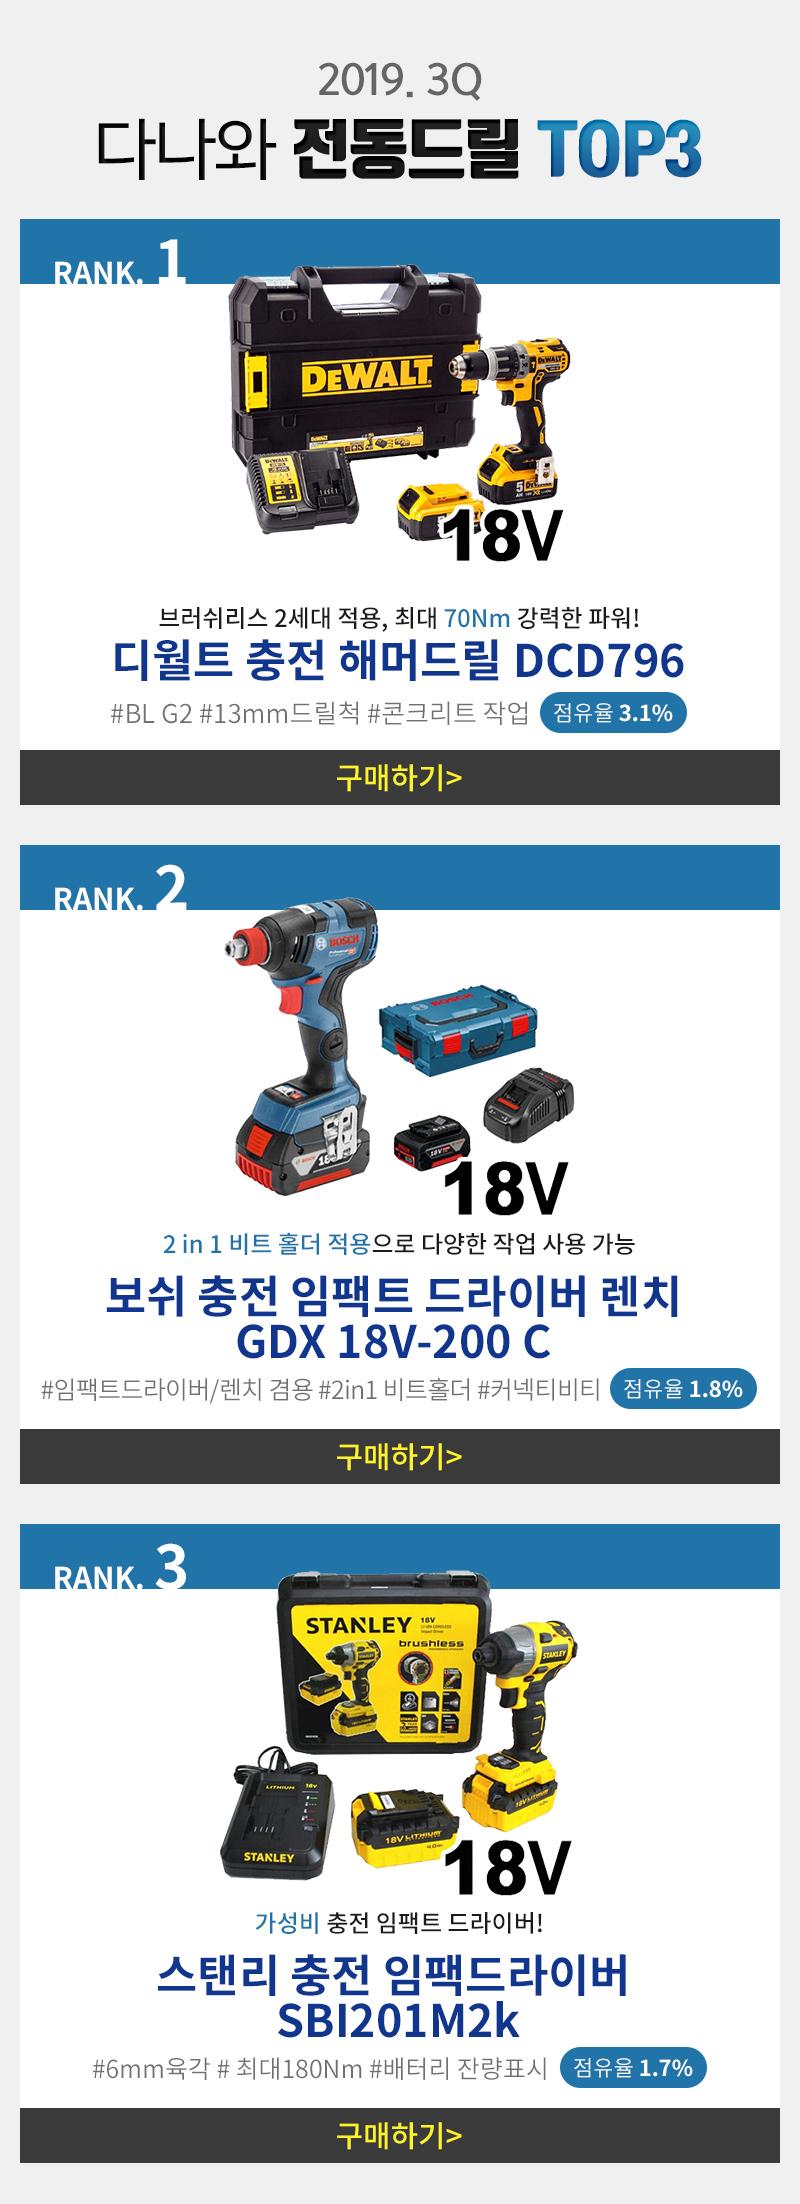 2019. 3Q 다나와 전동드릴 TOP3